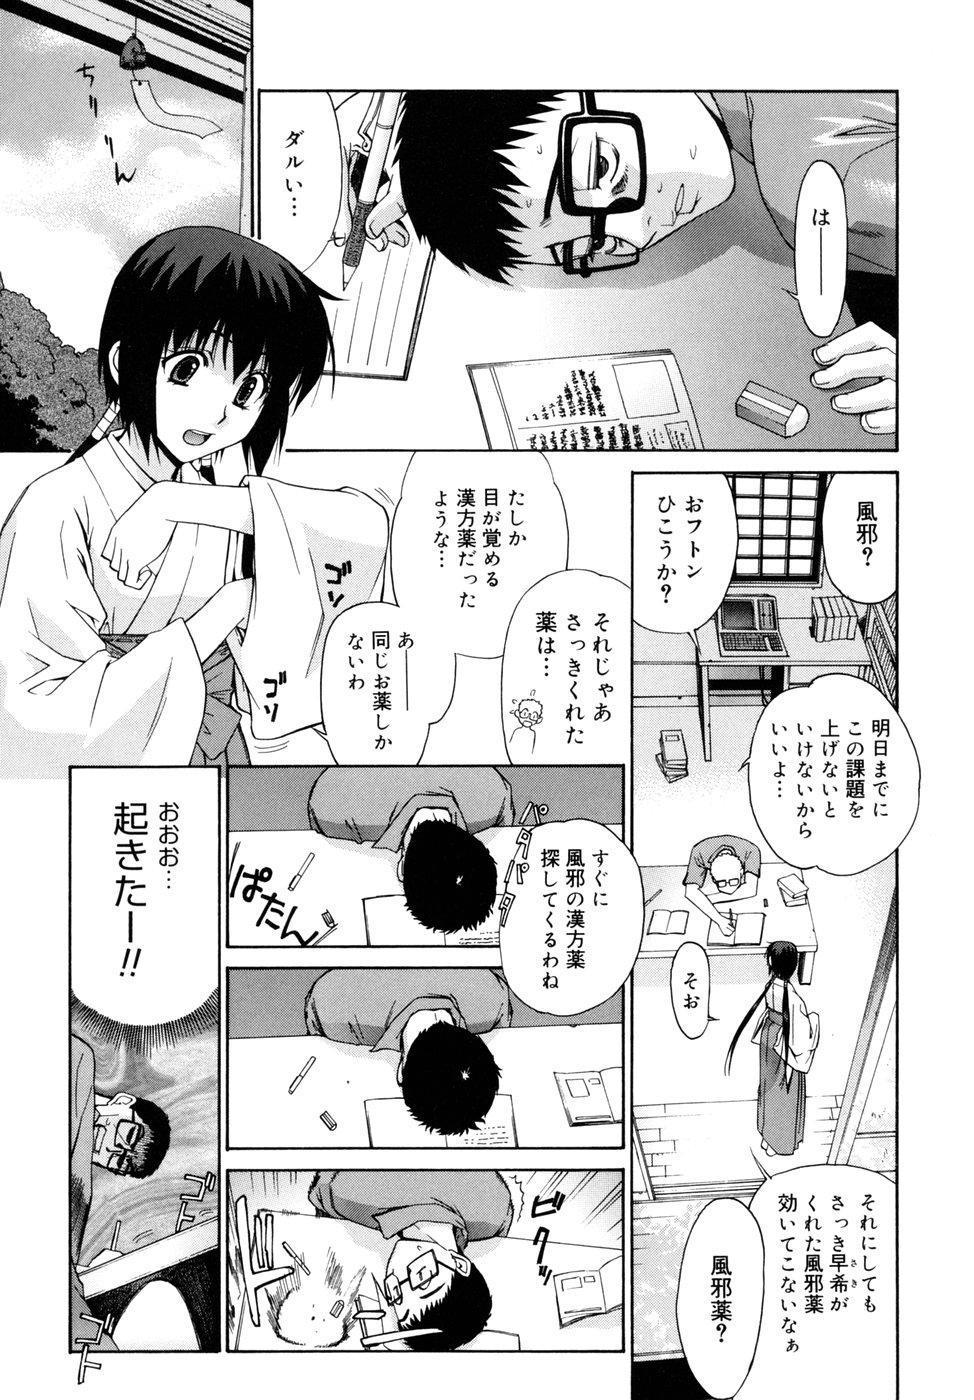 [Yaya Hinata] Tonari no Miko-san wa Minna Warau - The next shrine maidens smile in everyone. 98